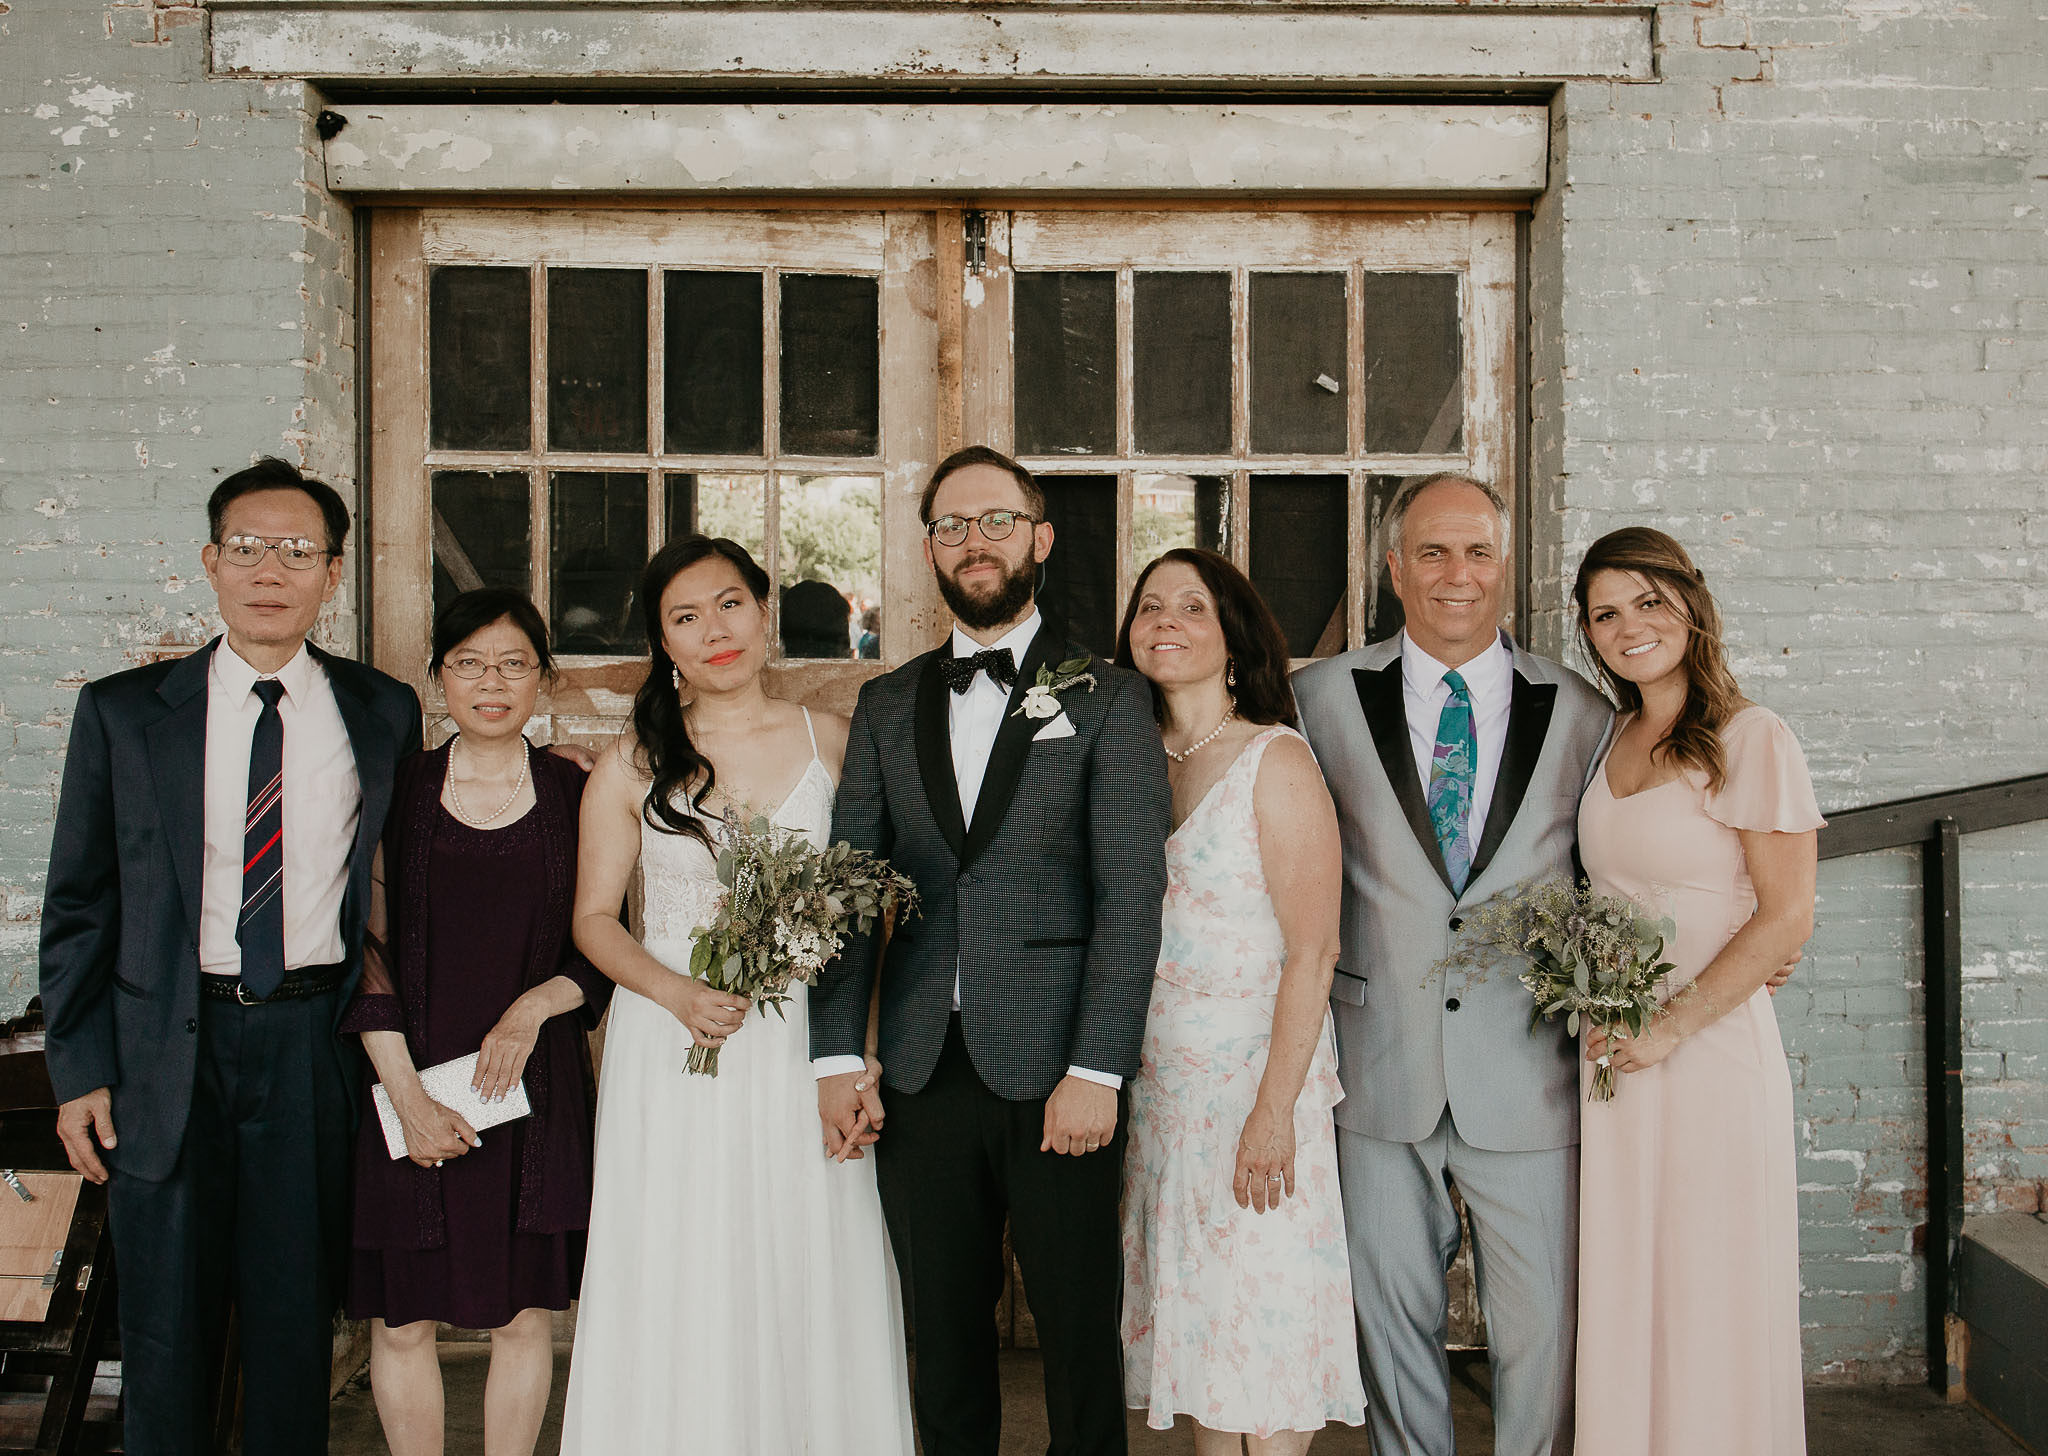 Jess+Matt_wedding-325.JPG